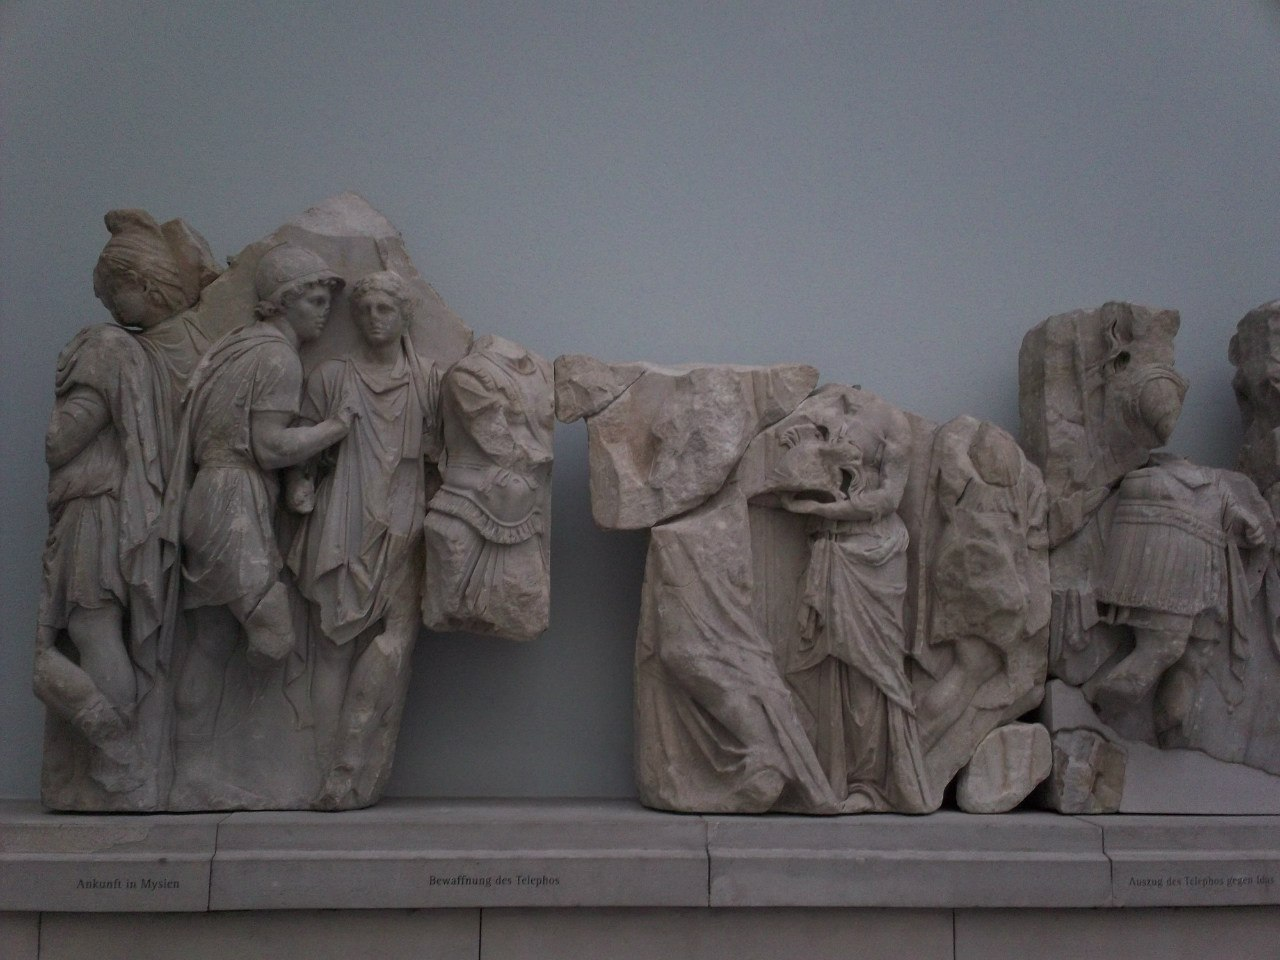 Елена Руденко. Германия. Берлин. Музей Пергамон. 2013 г. июнь. JIW1i9S-kNs